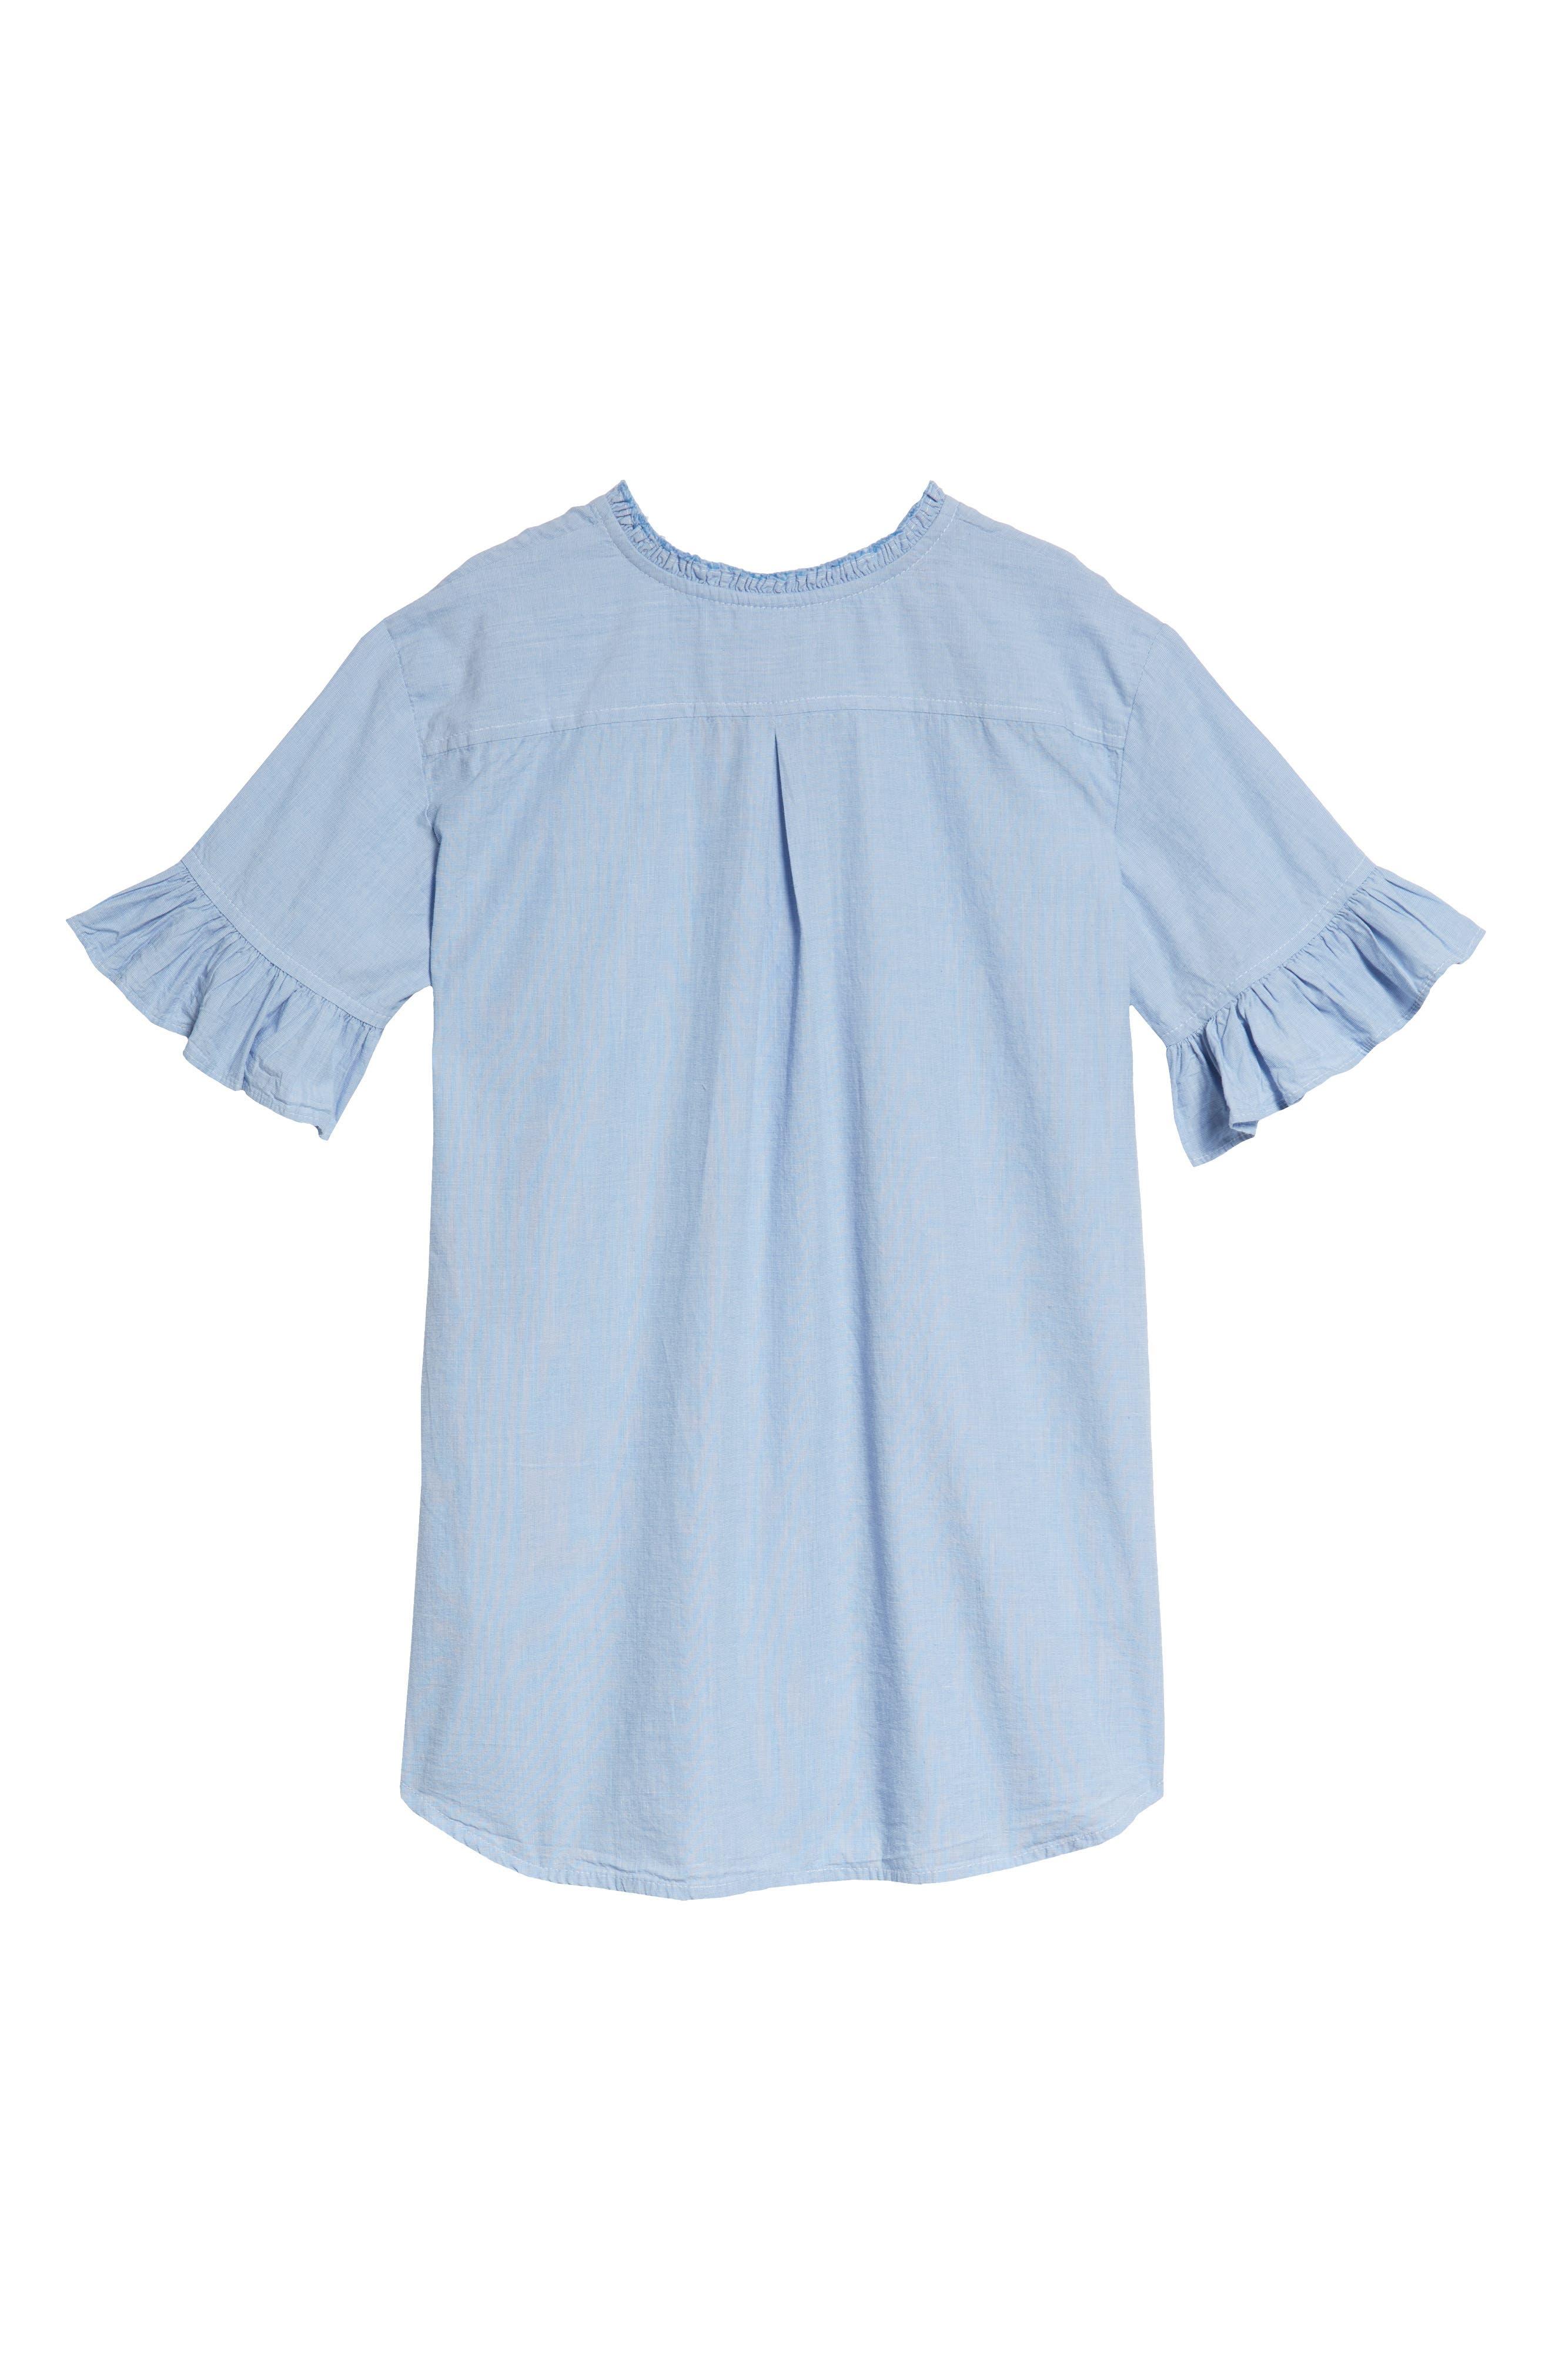 Ruffle Shirtdress,                             Alternate thumbnail 2, color,                             Blue Chambray Grid